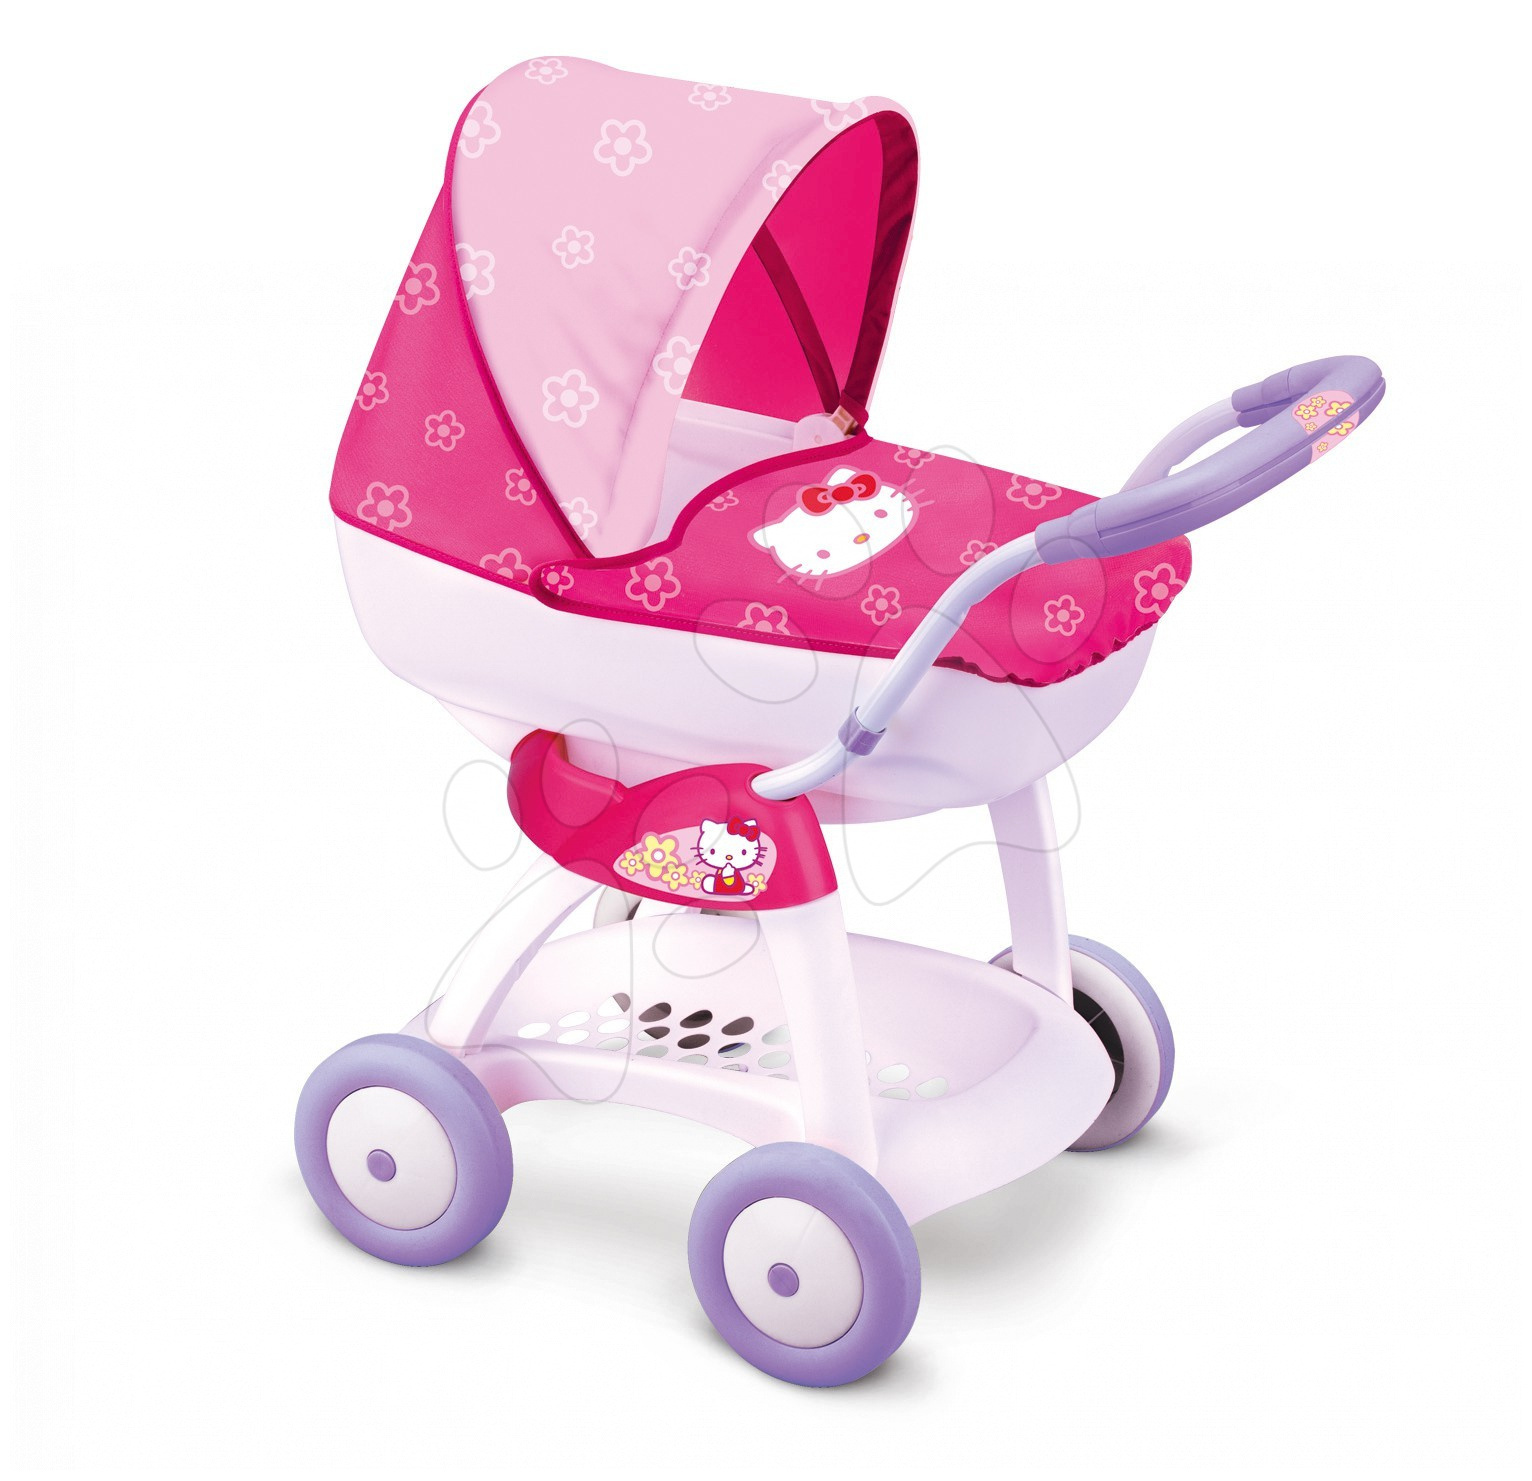 Cărucior Hello Kitty Chuli Pop car Smoby cu mâner de împins de 55 de cm  60*38*55 cm de la 18 luni